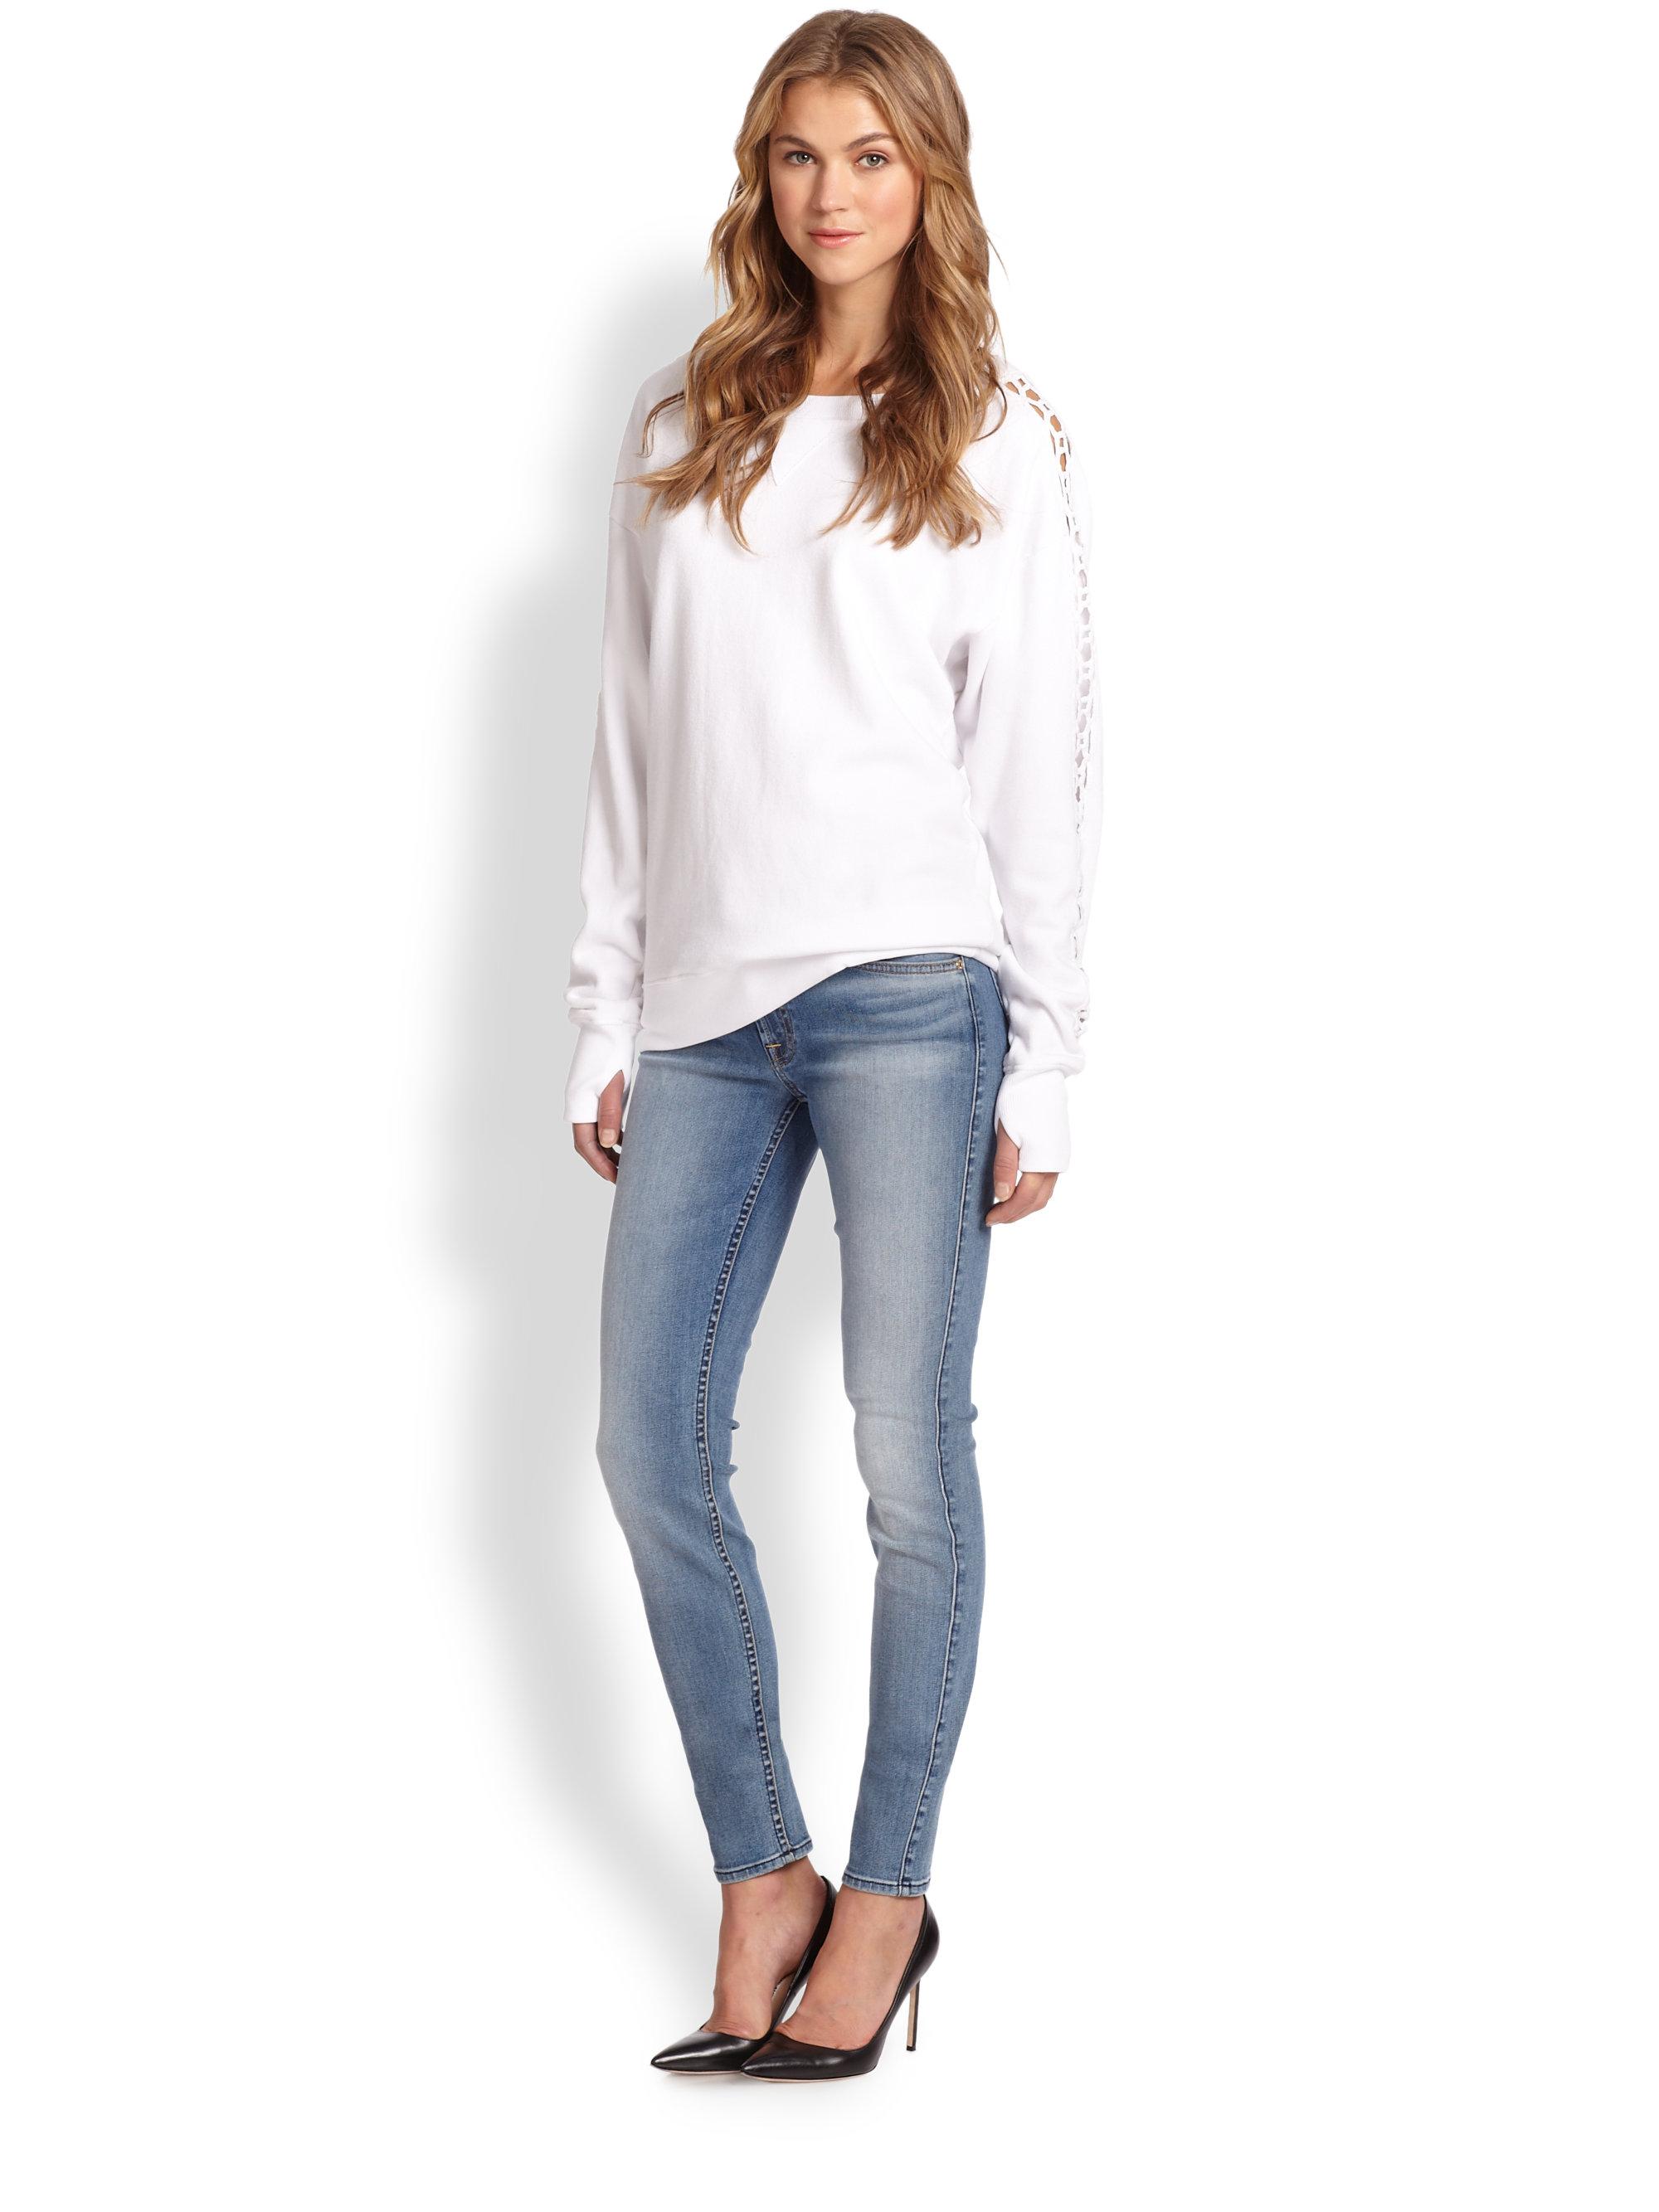 lyst 7 for all mankind slim illusion skinny jeans in blue. Black Bedroom Furniture Sets. Home Design Ideas